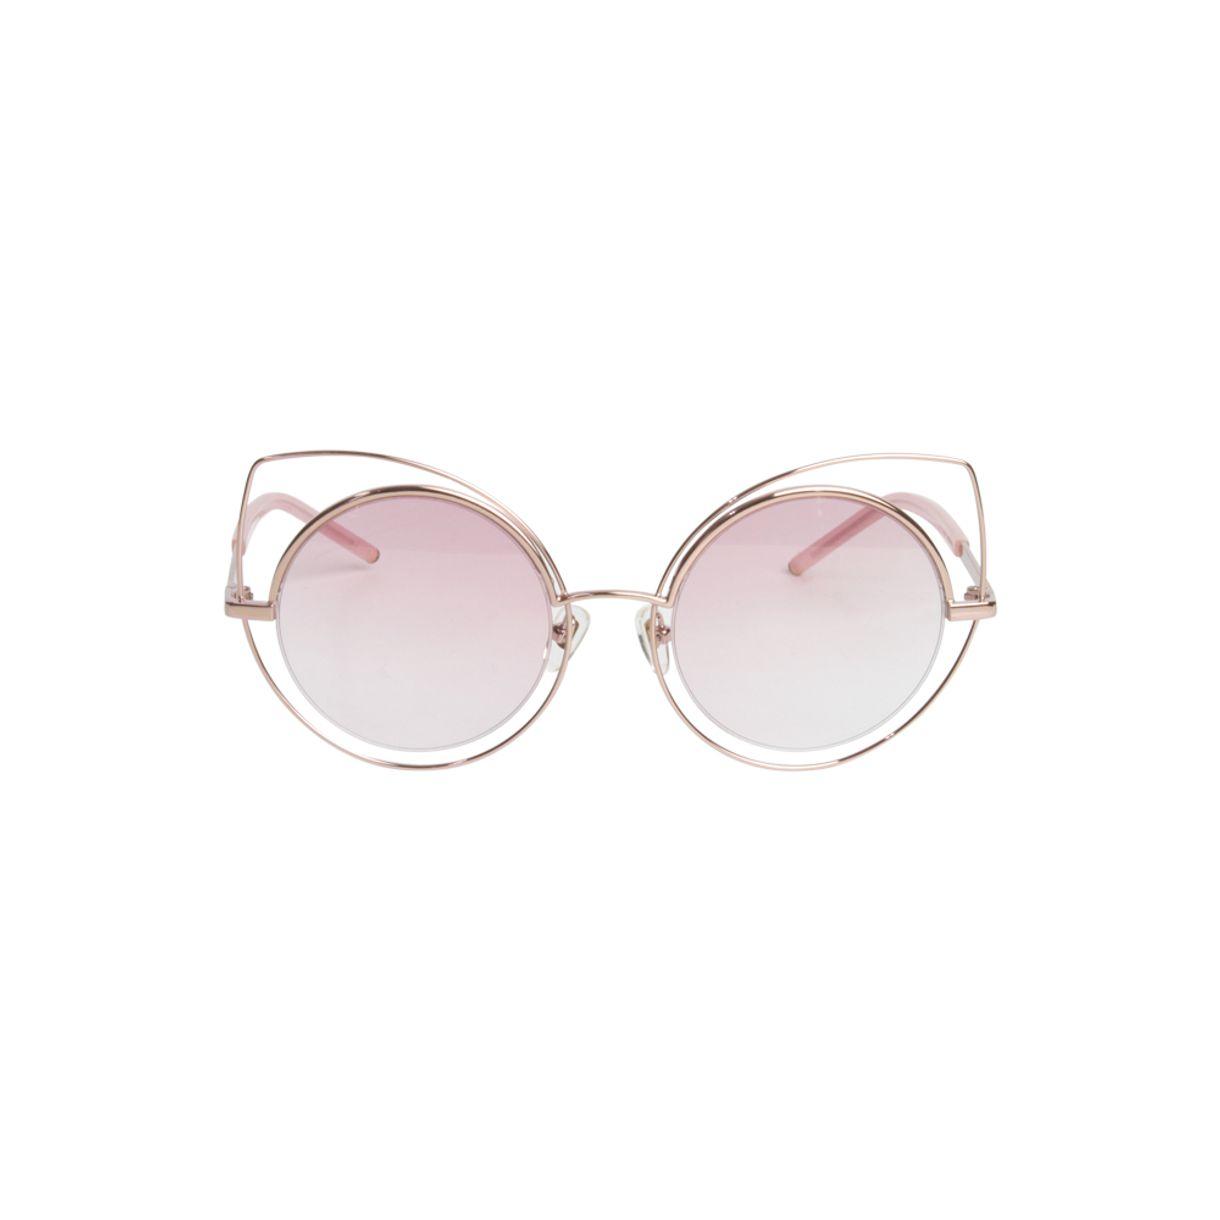 Oculos-Marc-Jacobs-10_S-Rosa.jpg